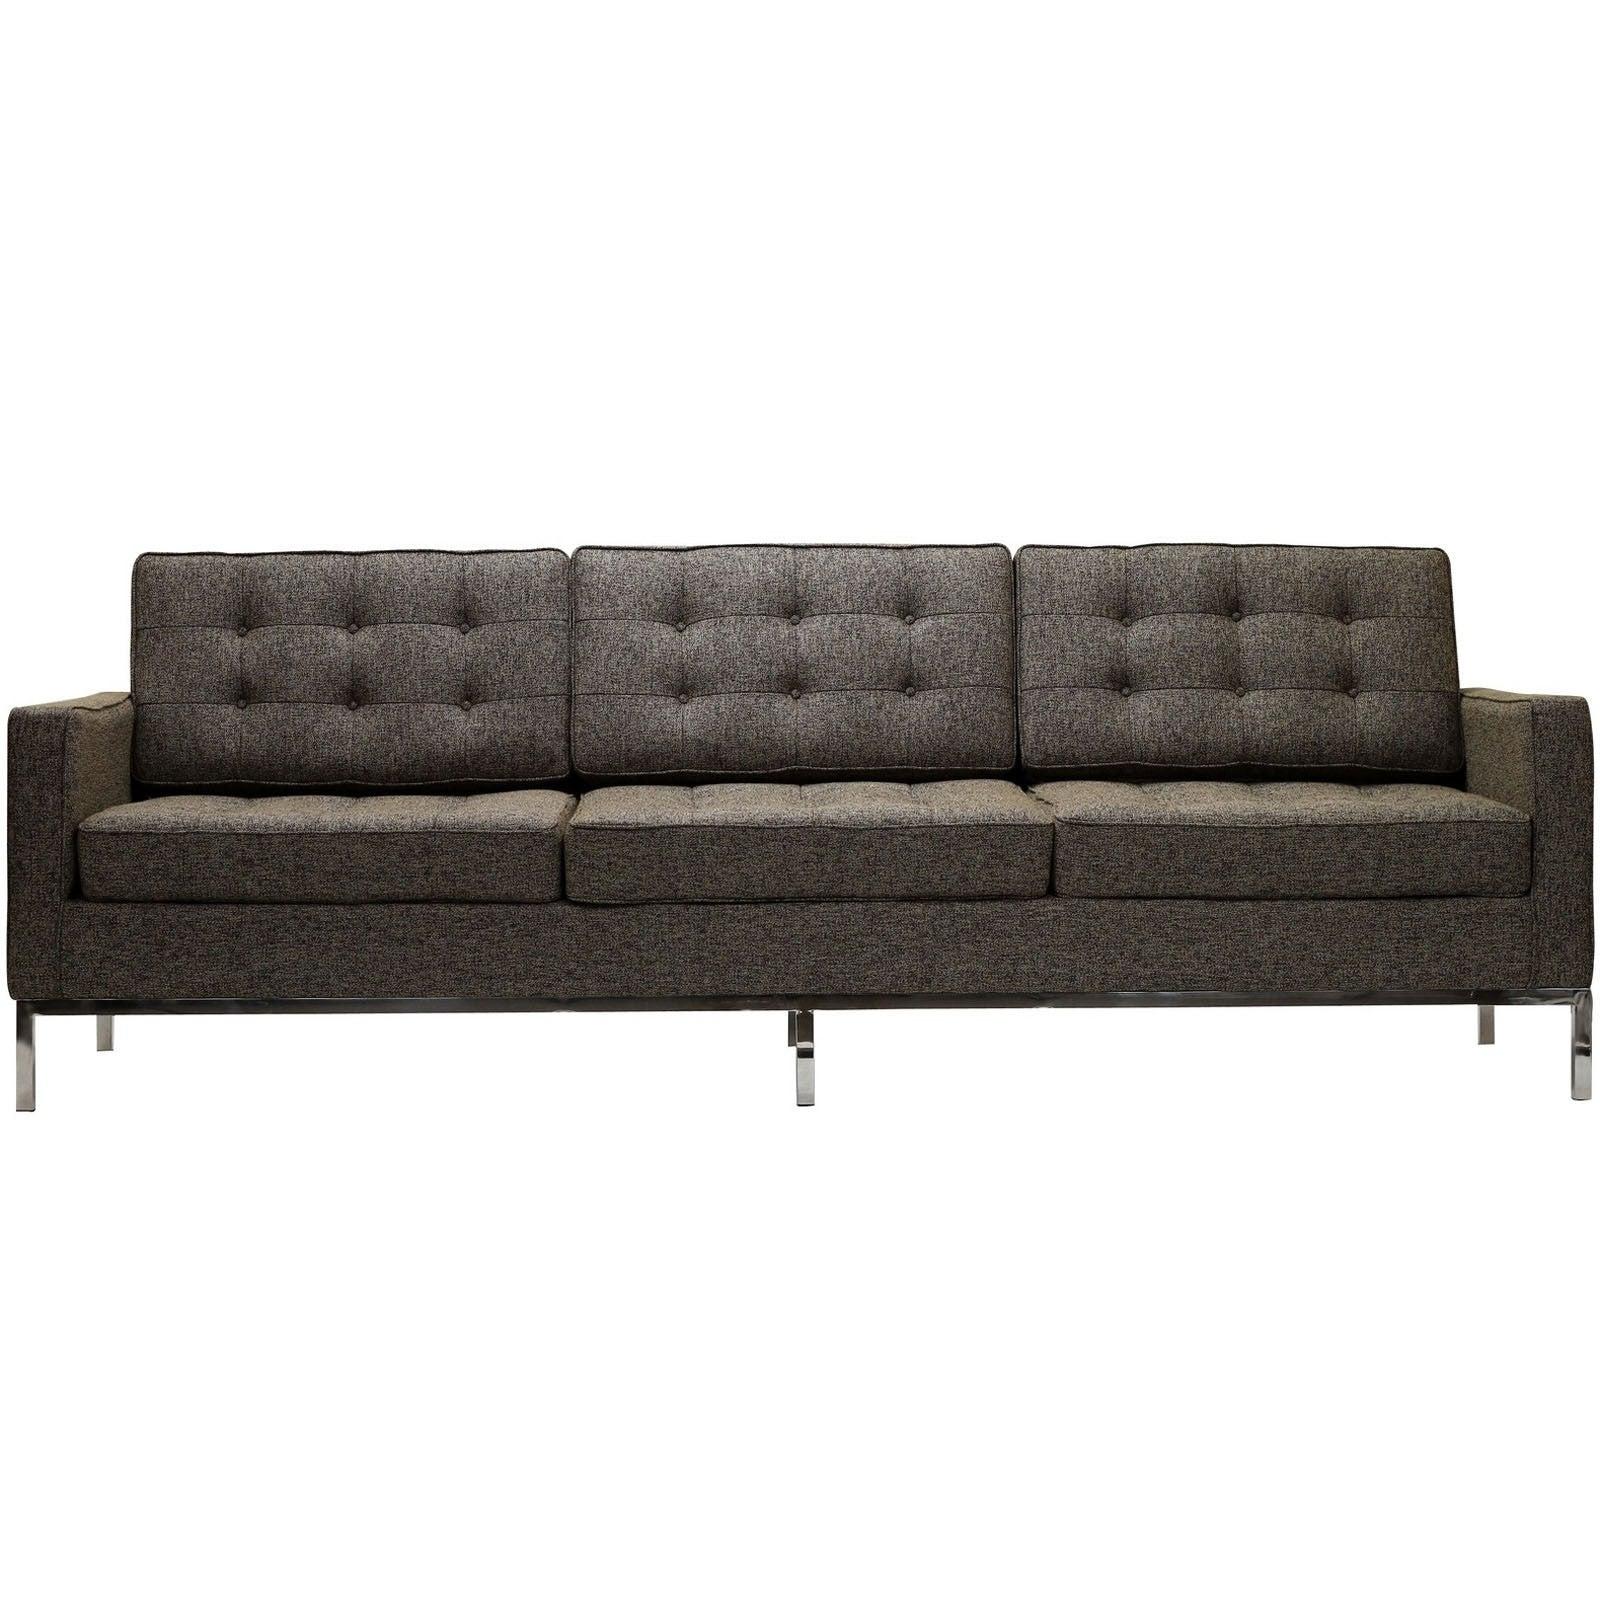 replica florence knoll sofa nz cama saba el corte ingles reproduction fabric the modern source